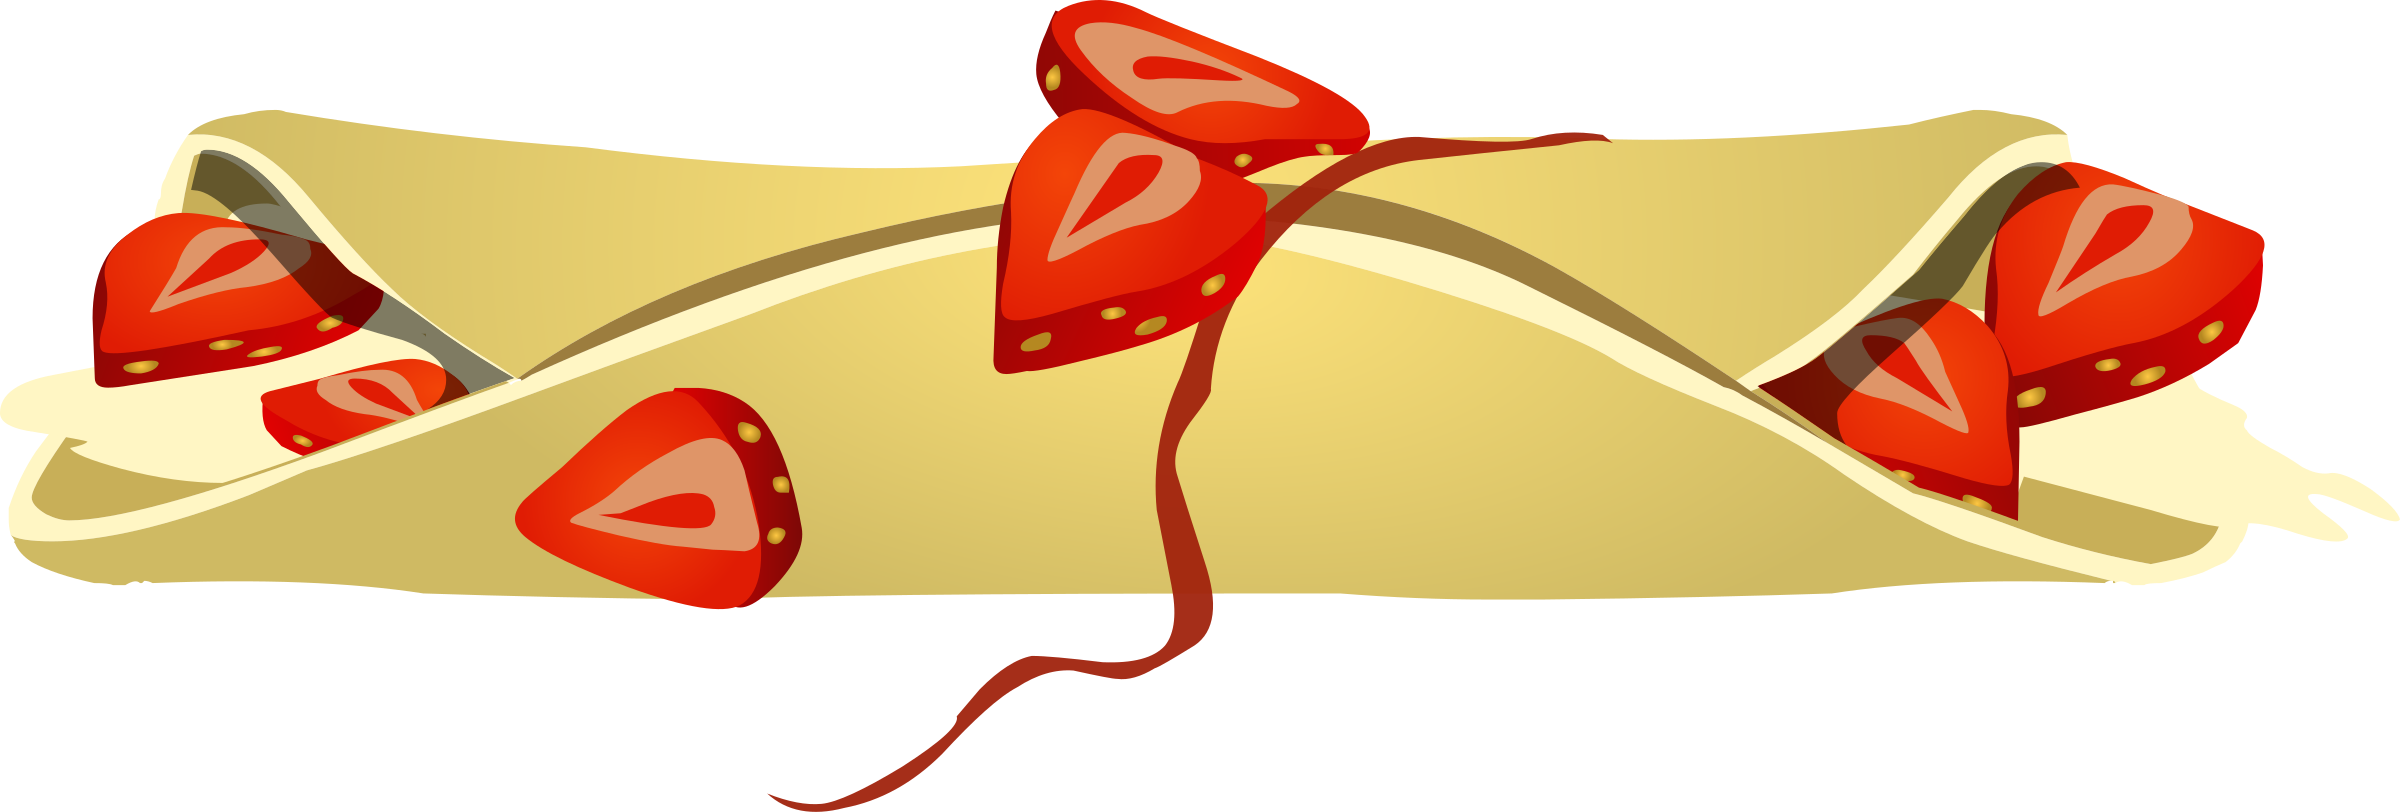 Crepe Clip Art.